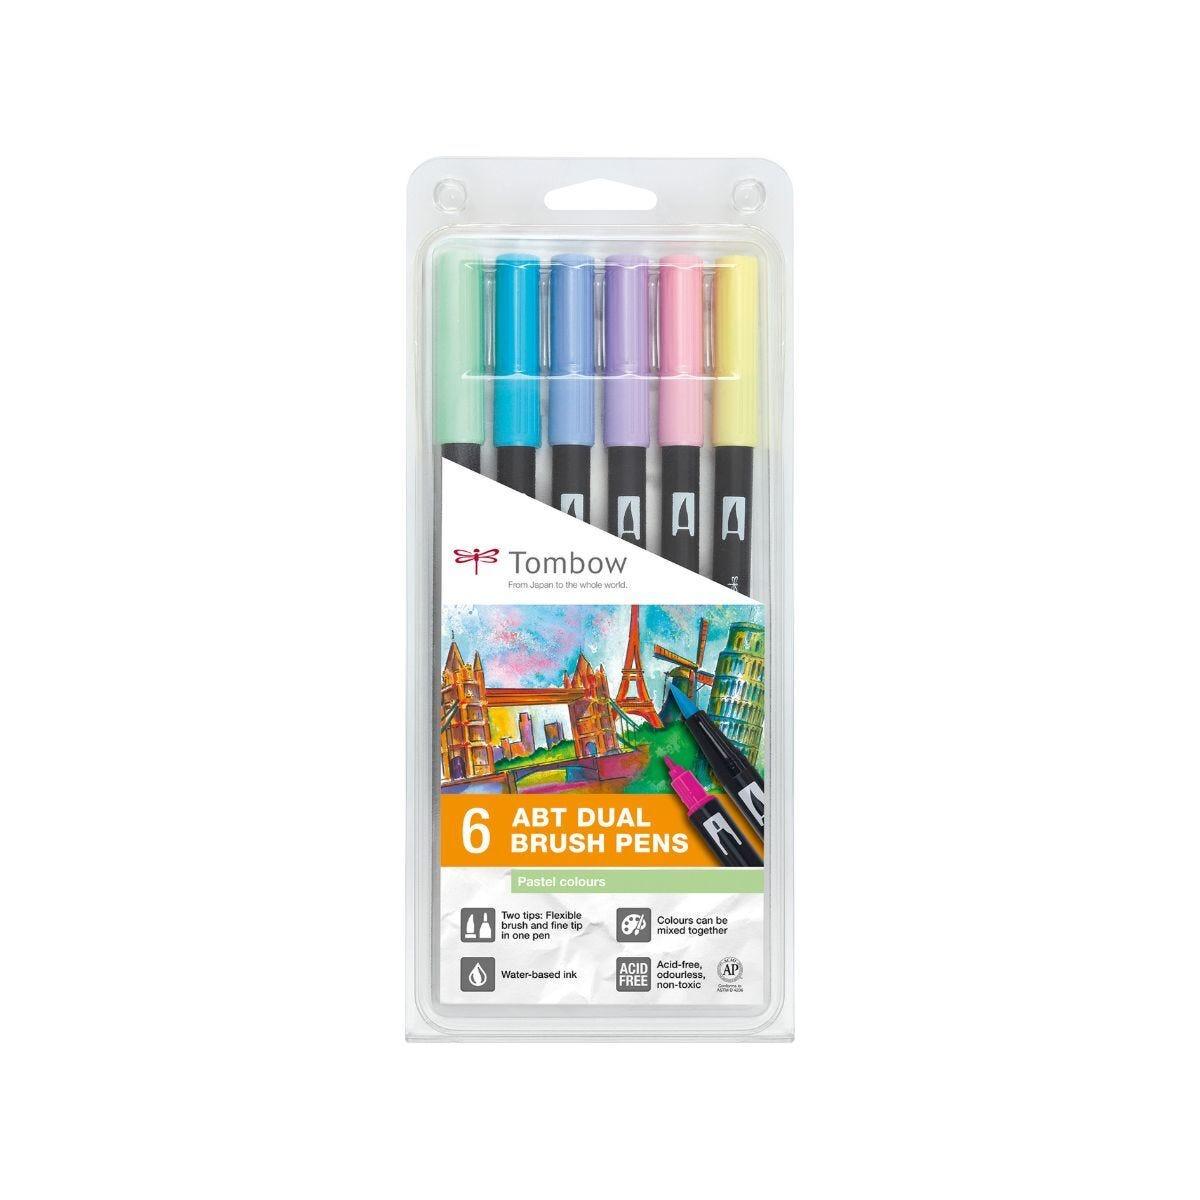 Tombow Art Dual Brush Pens Pastel Colours Pack of 6